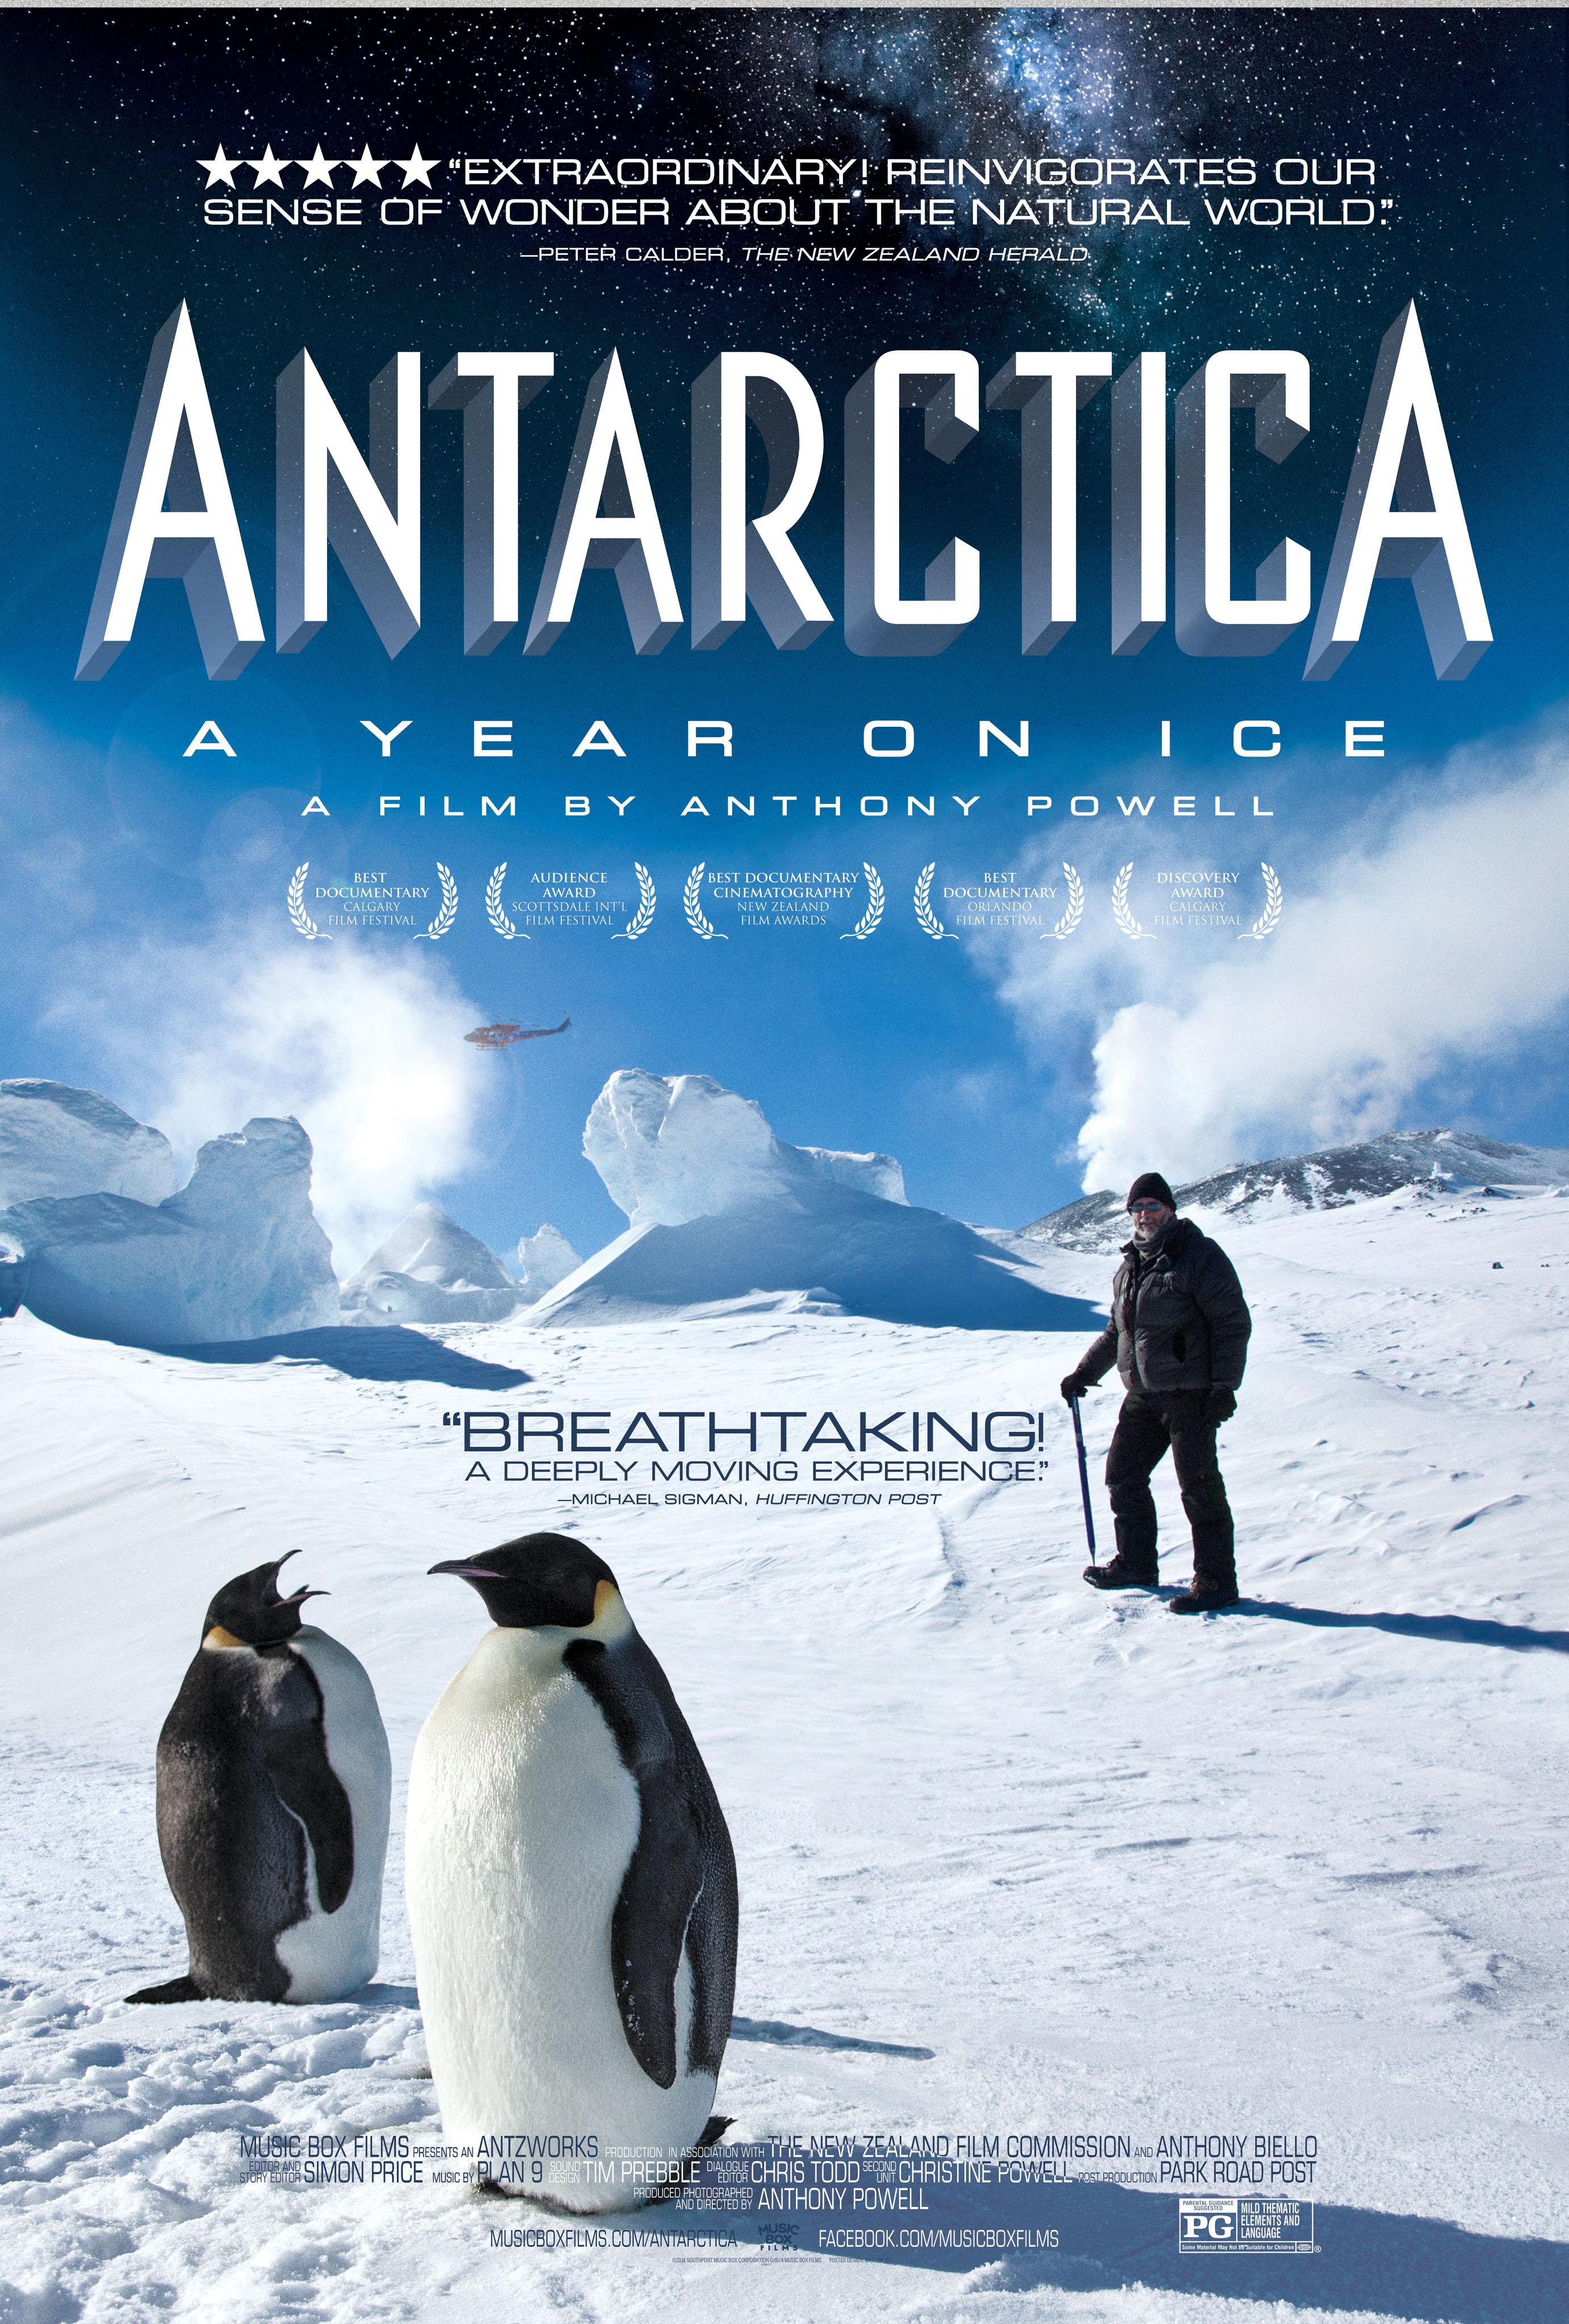 antarctica a year on ice (2013) imdb Netflix Documentaries